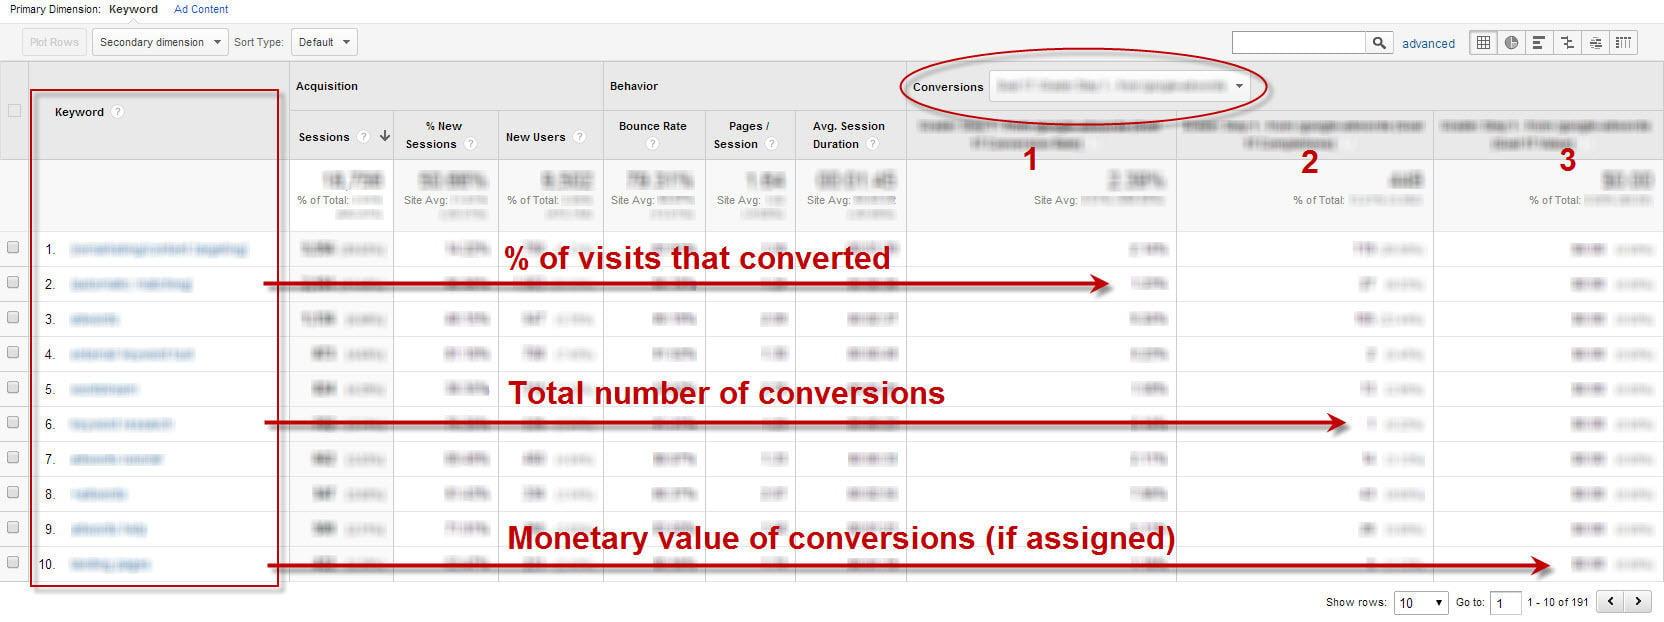 Commercial intent keywords Google Analytics report